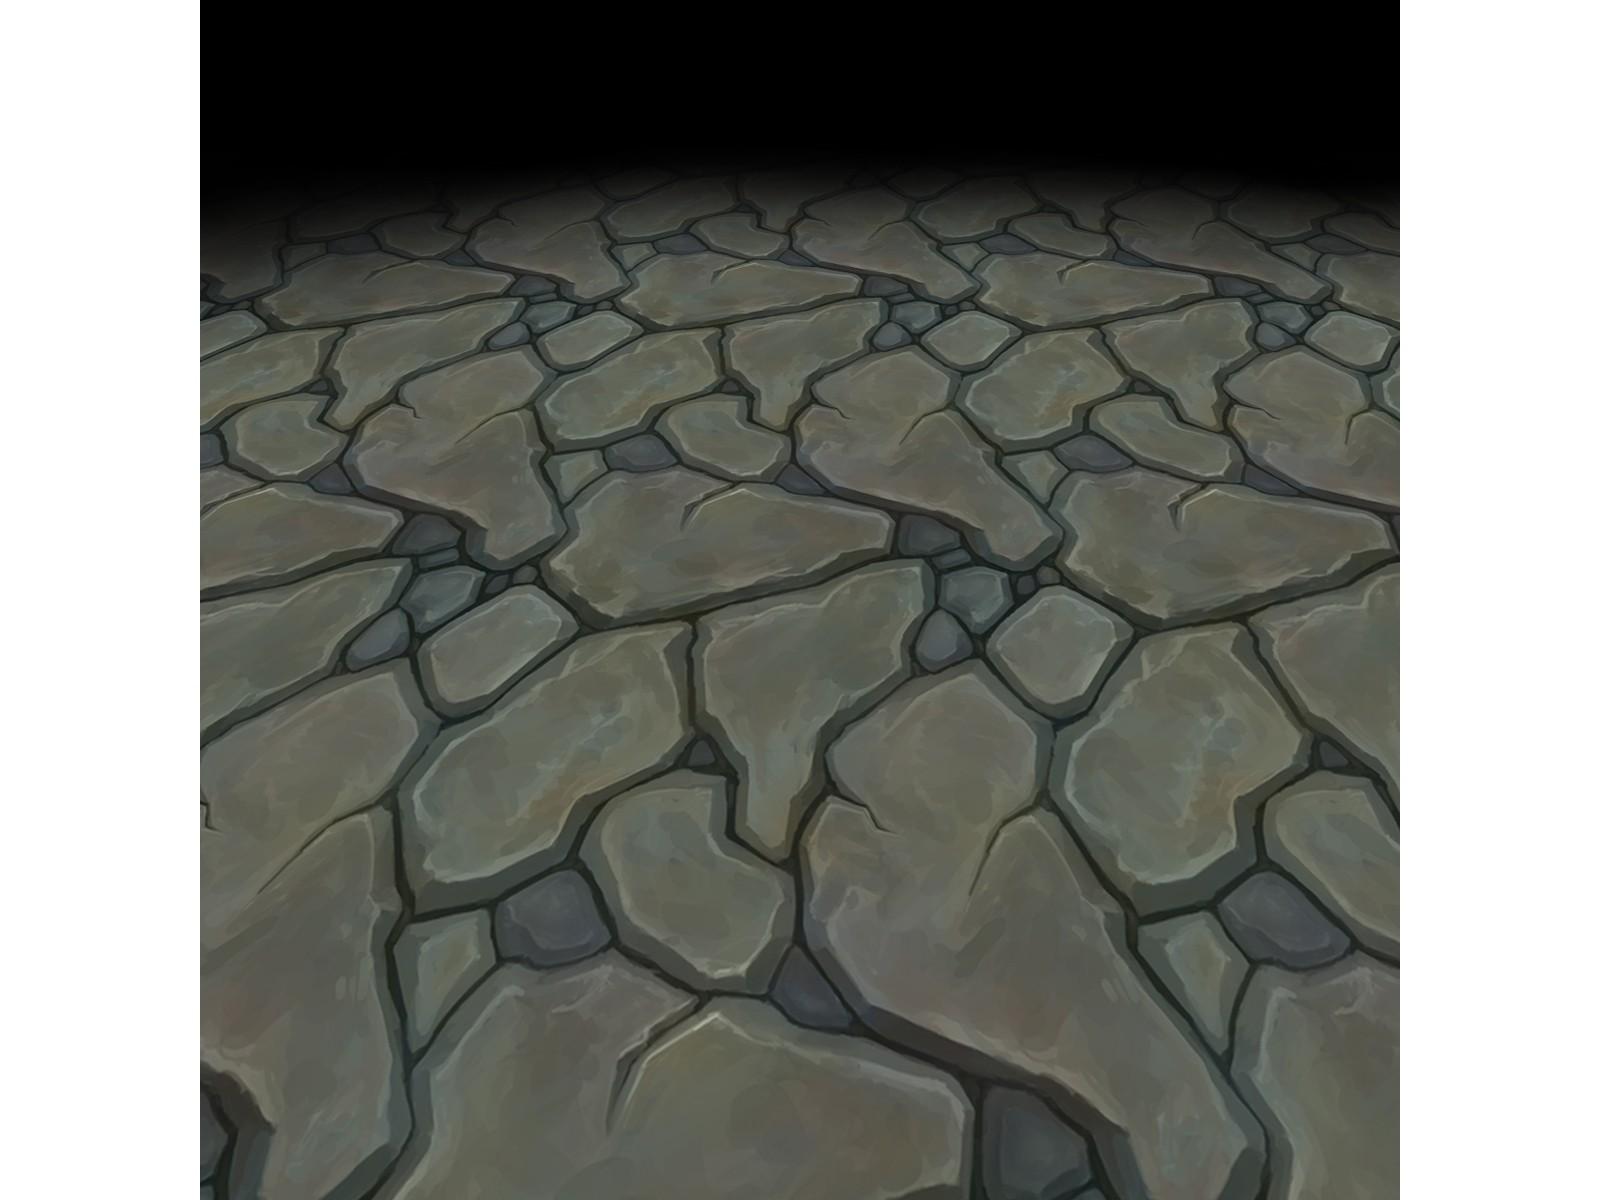 Stone floor texture 1 (hand painted)